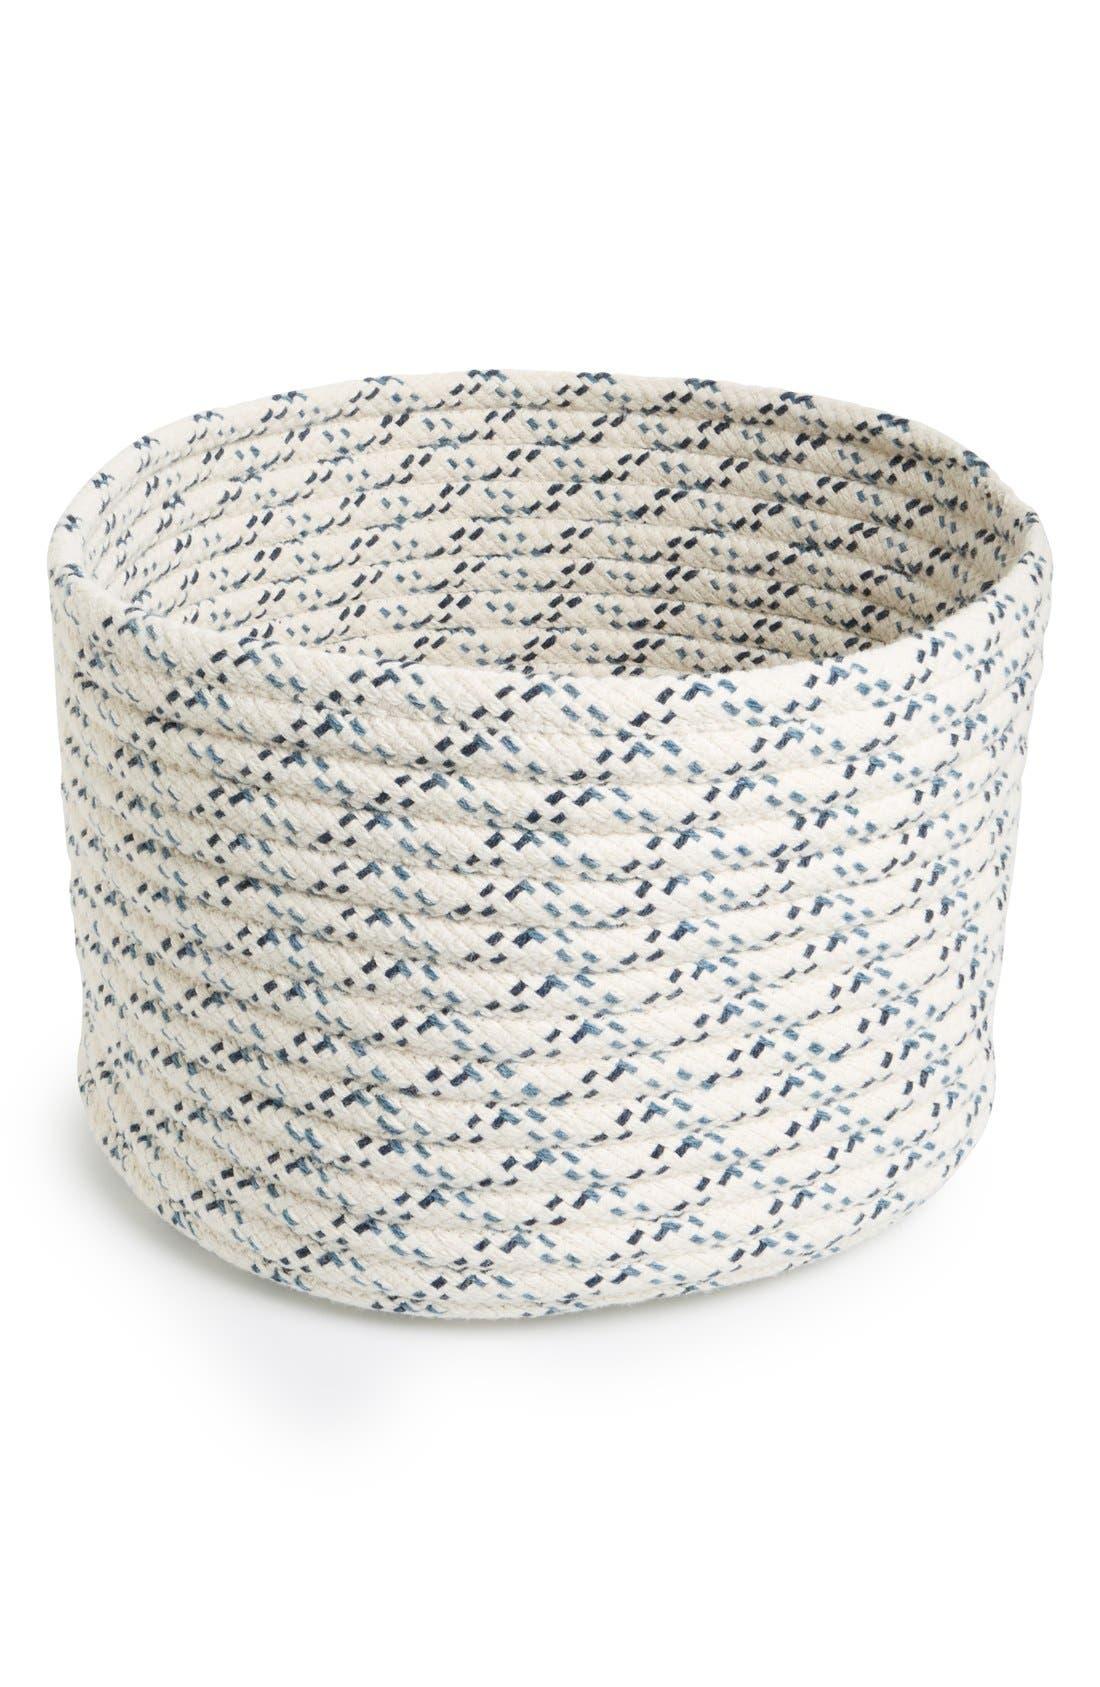 Alternate Image 1 Selected - Colonial Mills Braided Storage Basket